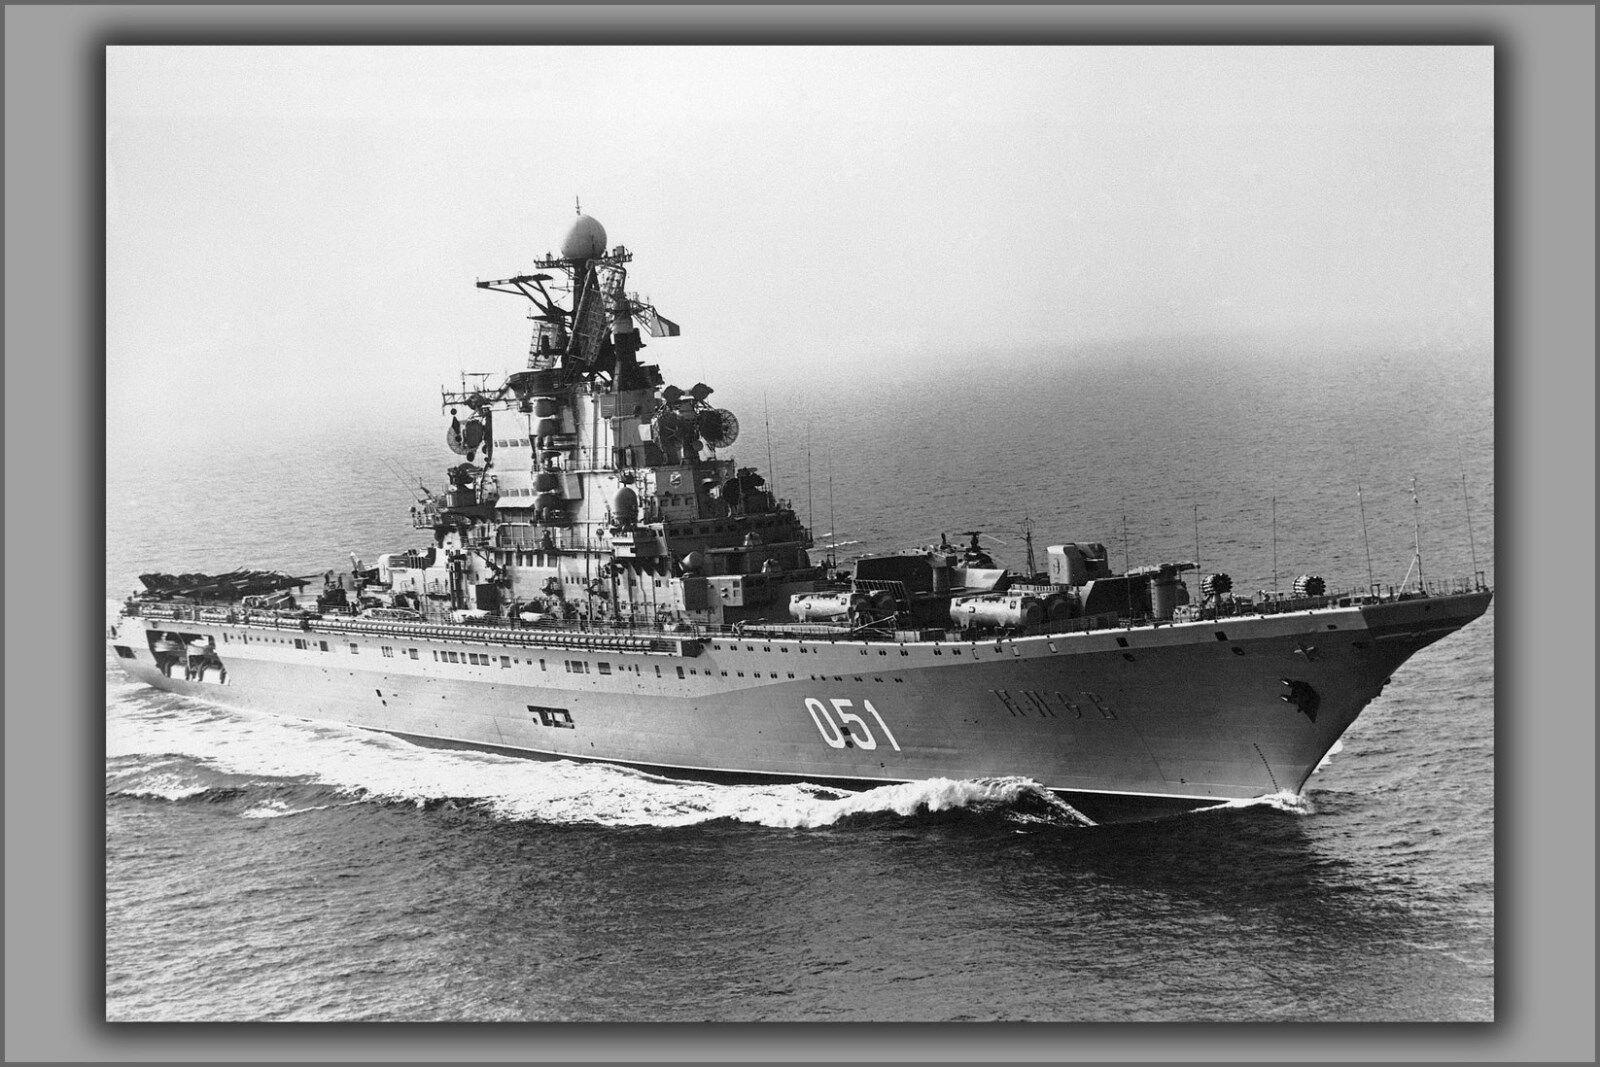 Poster, Many Größes; Soviet Aircraft Carrier Kiev (Cvhg 051)